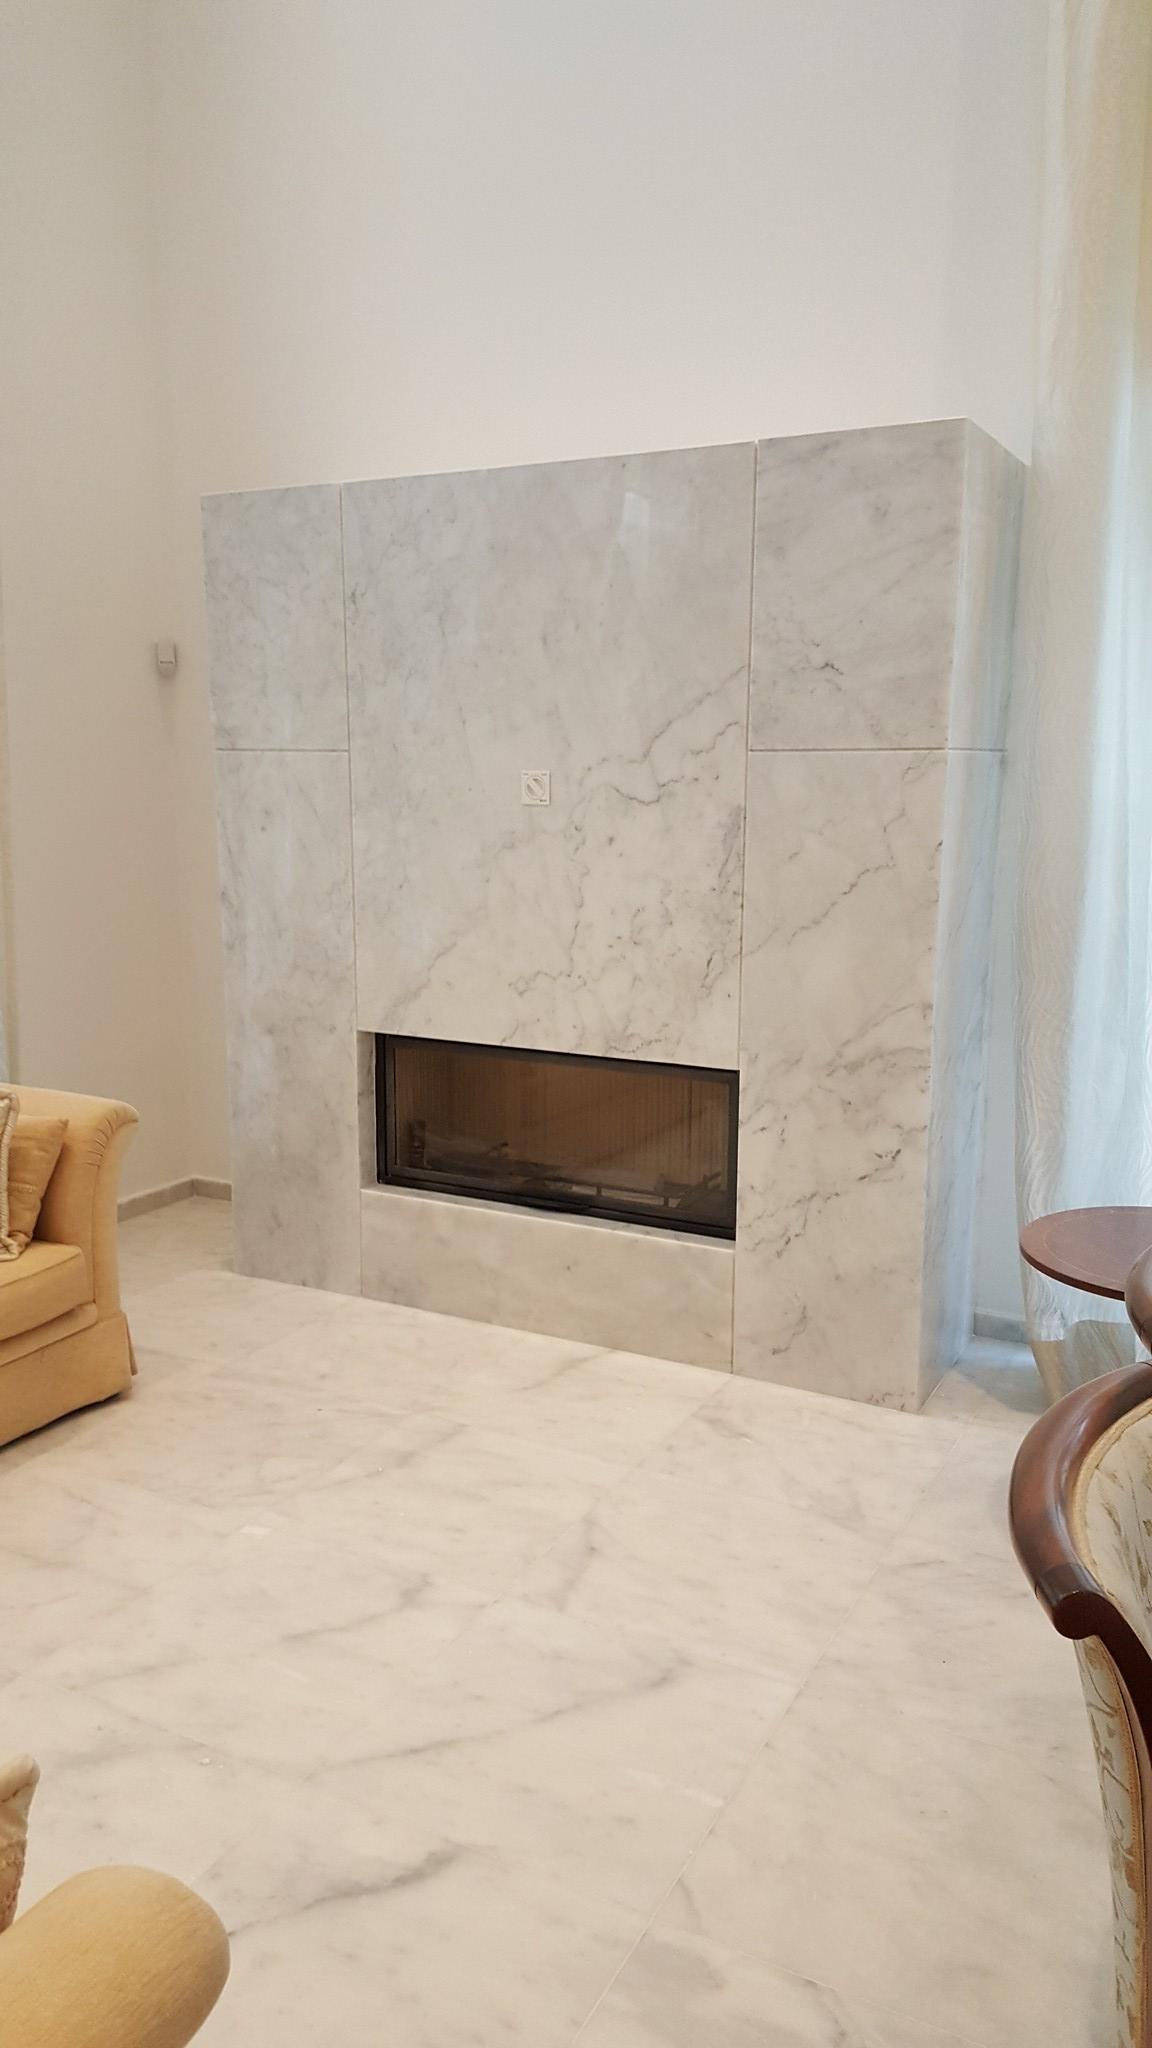 StavART Fireplace 1.jpg